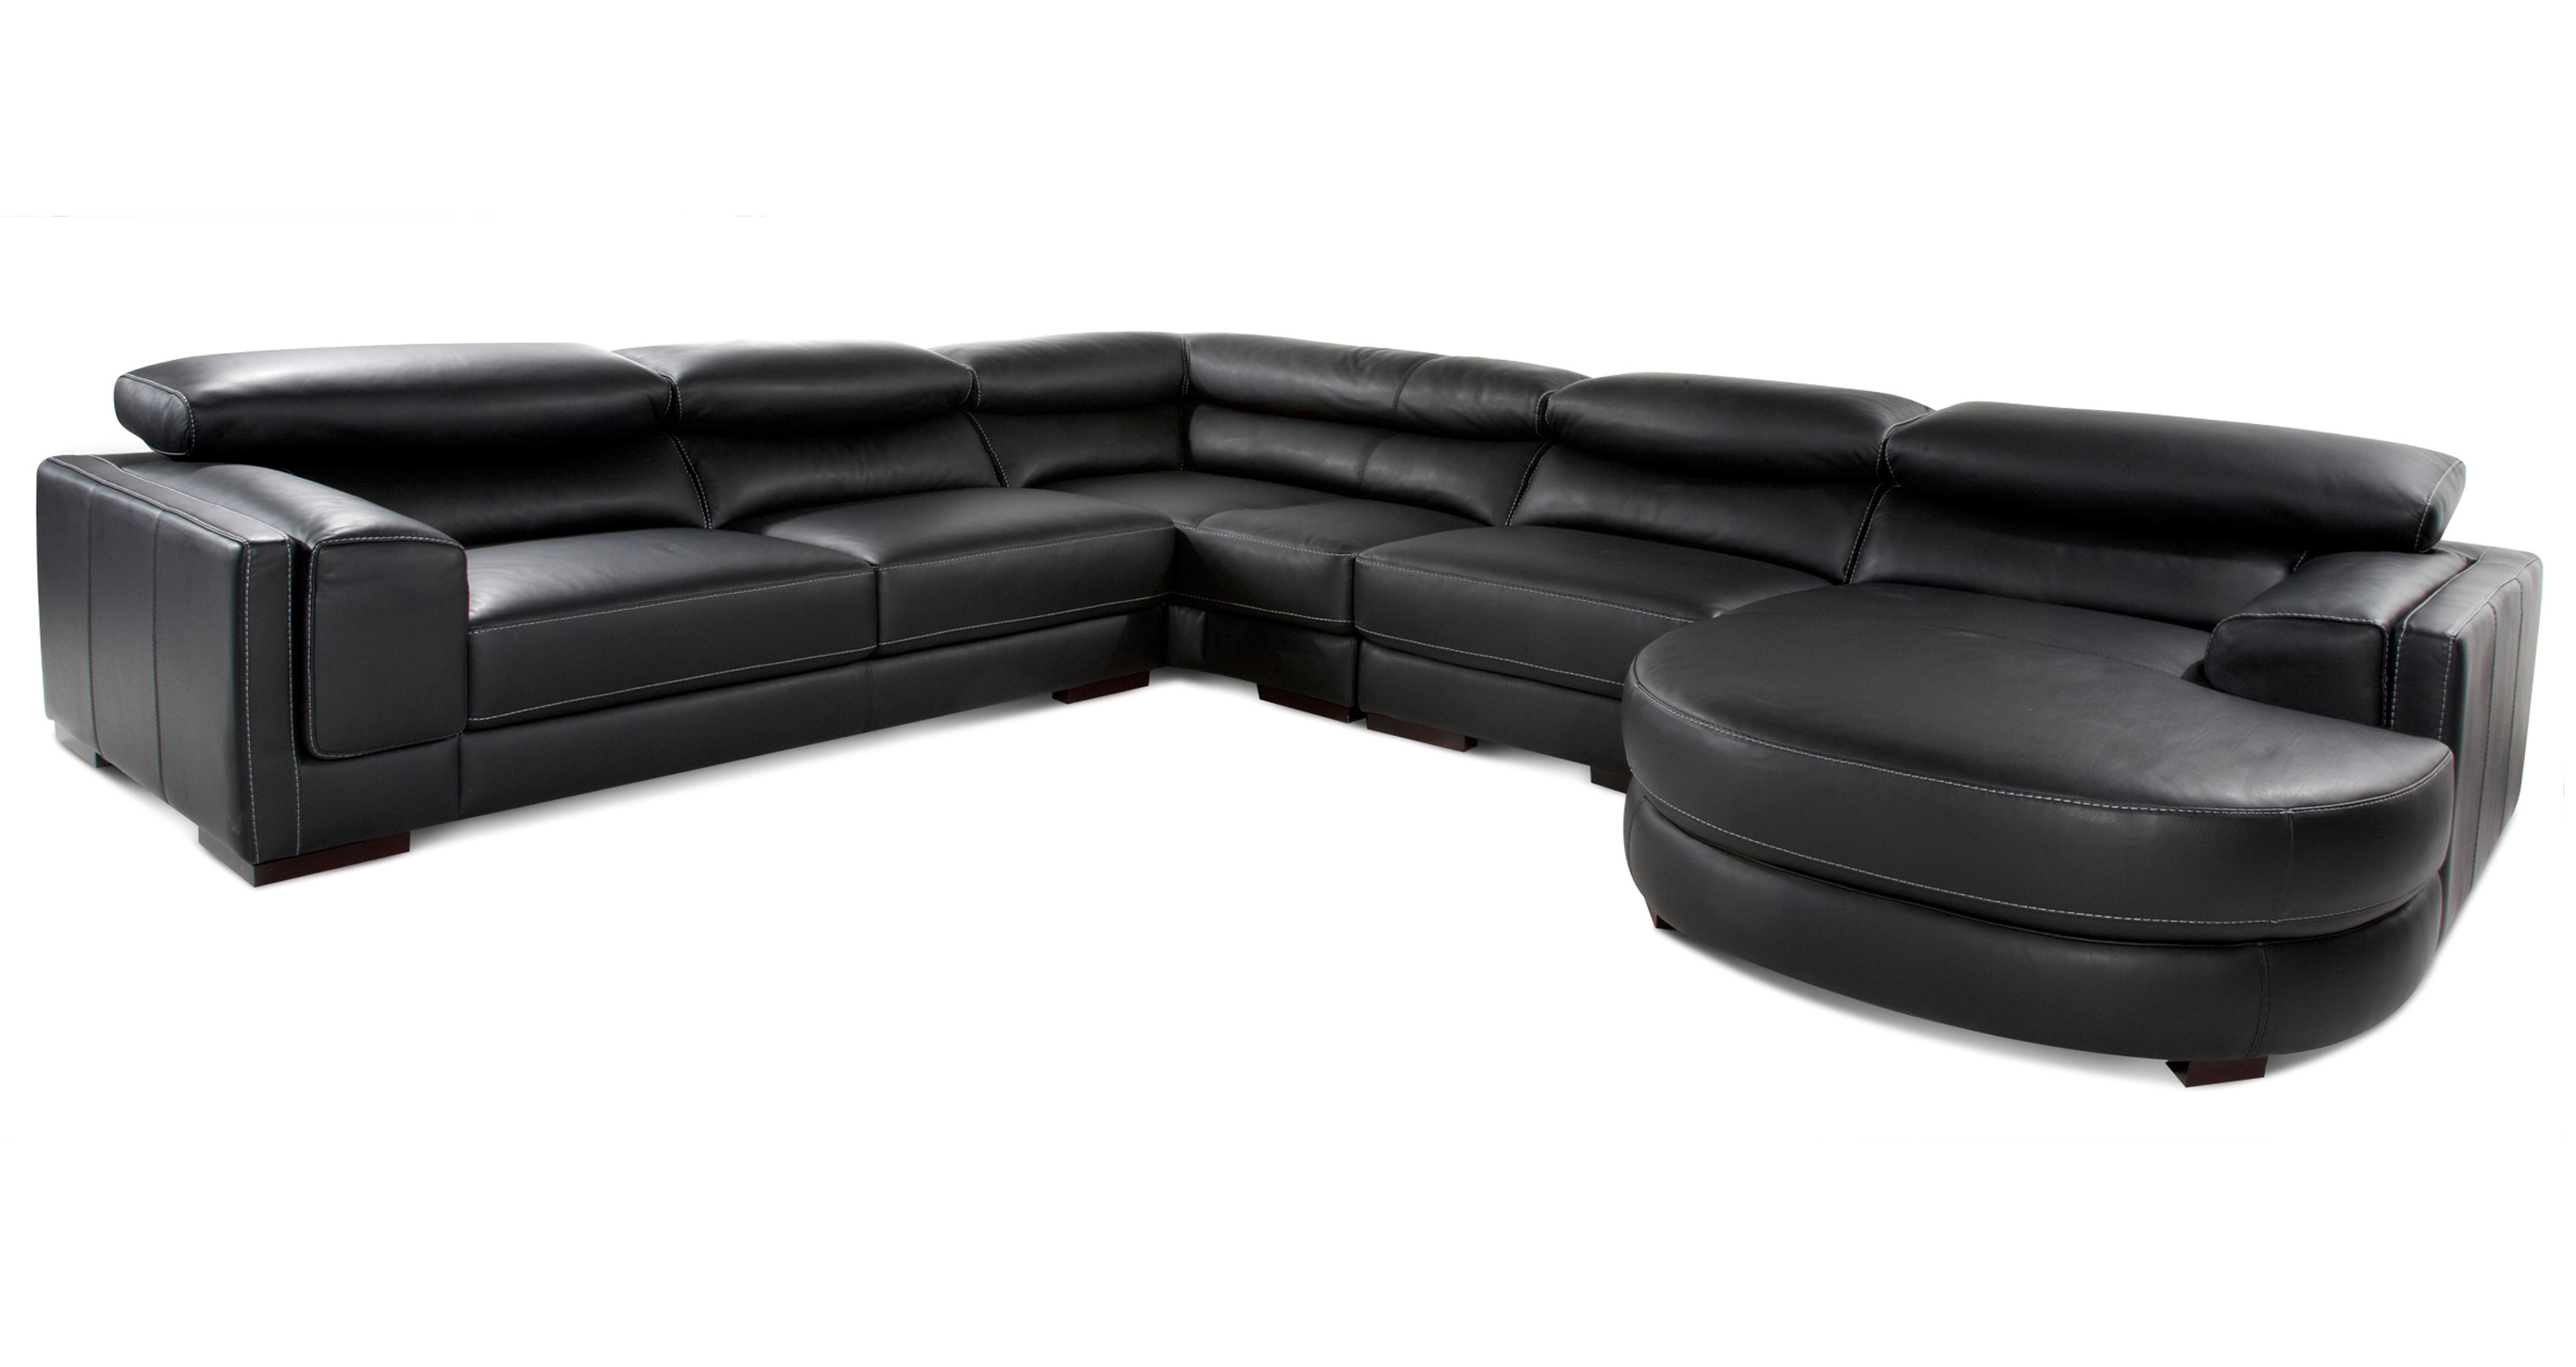 Tremendous London 4 Piece Corner Sofa Interior Design Ideas Gentotryabchikinfo